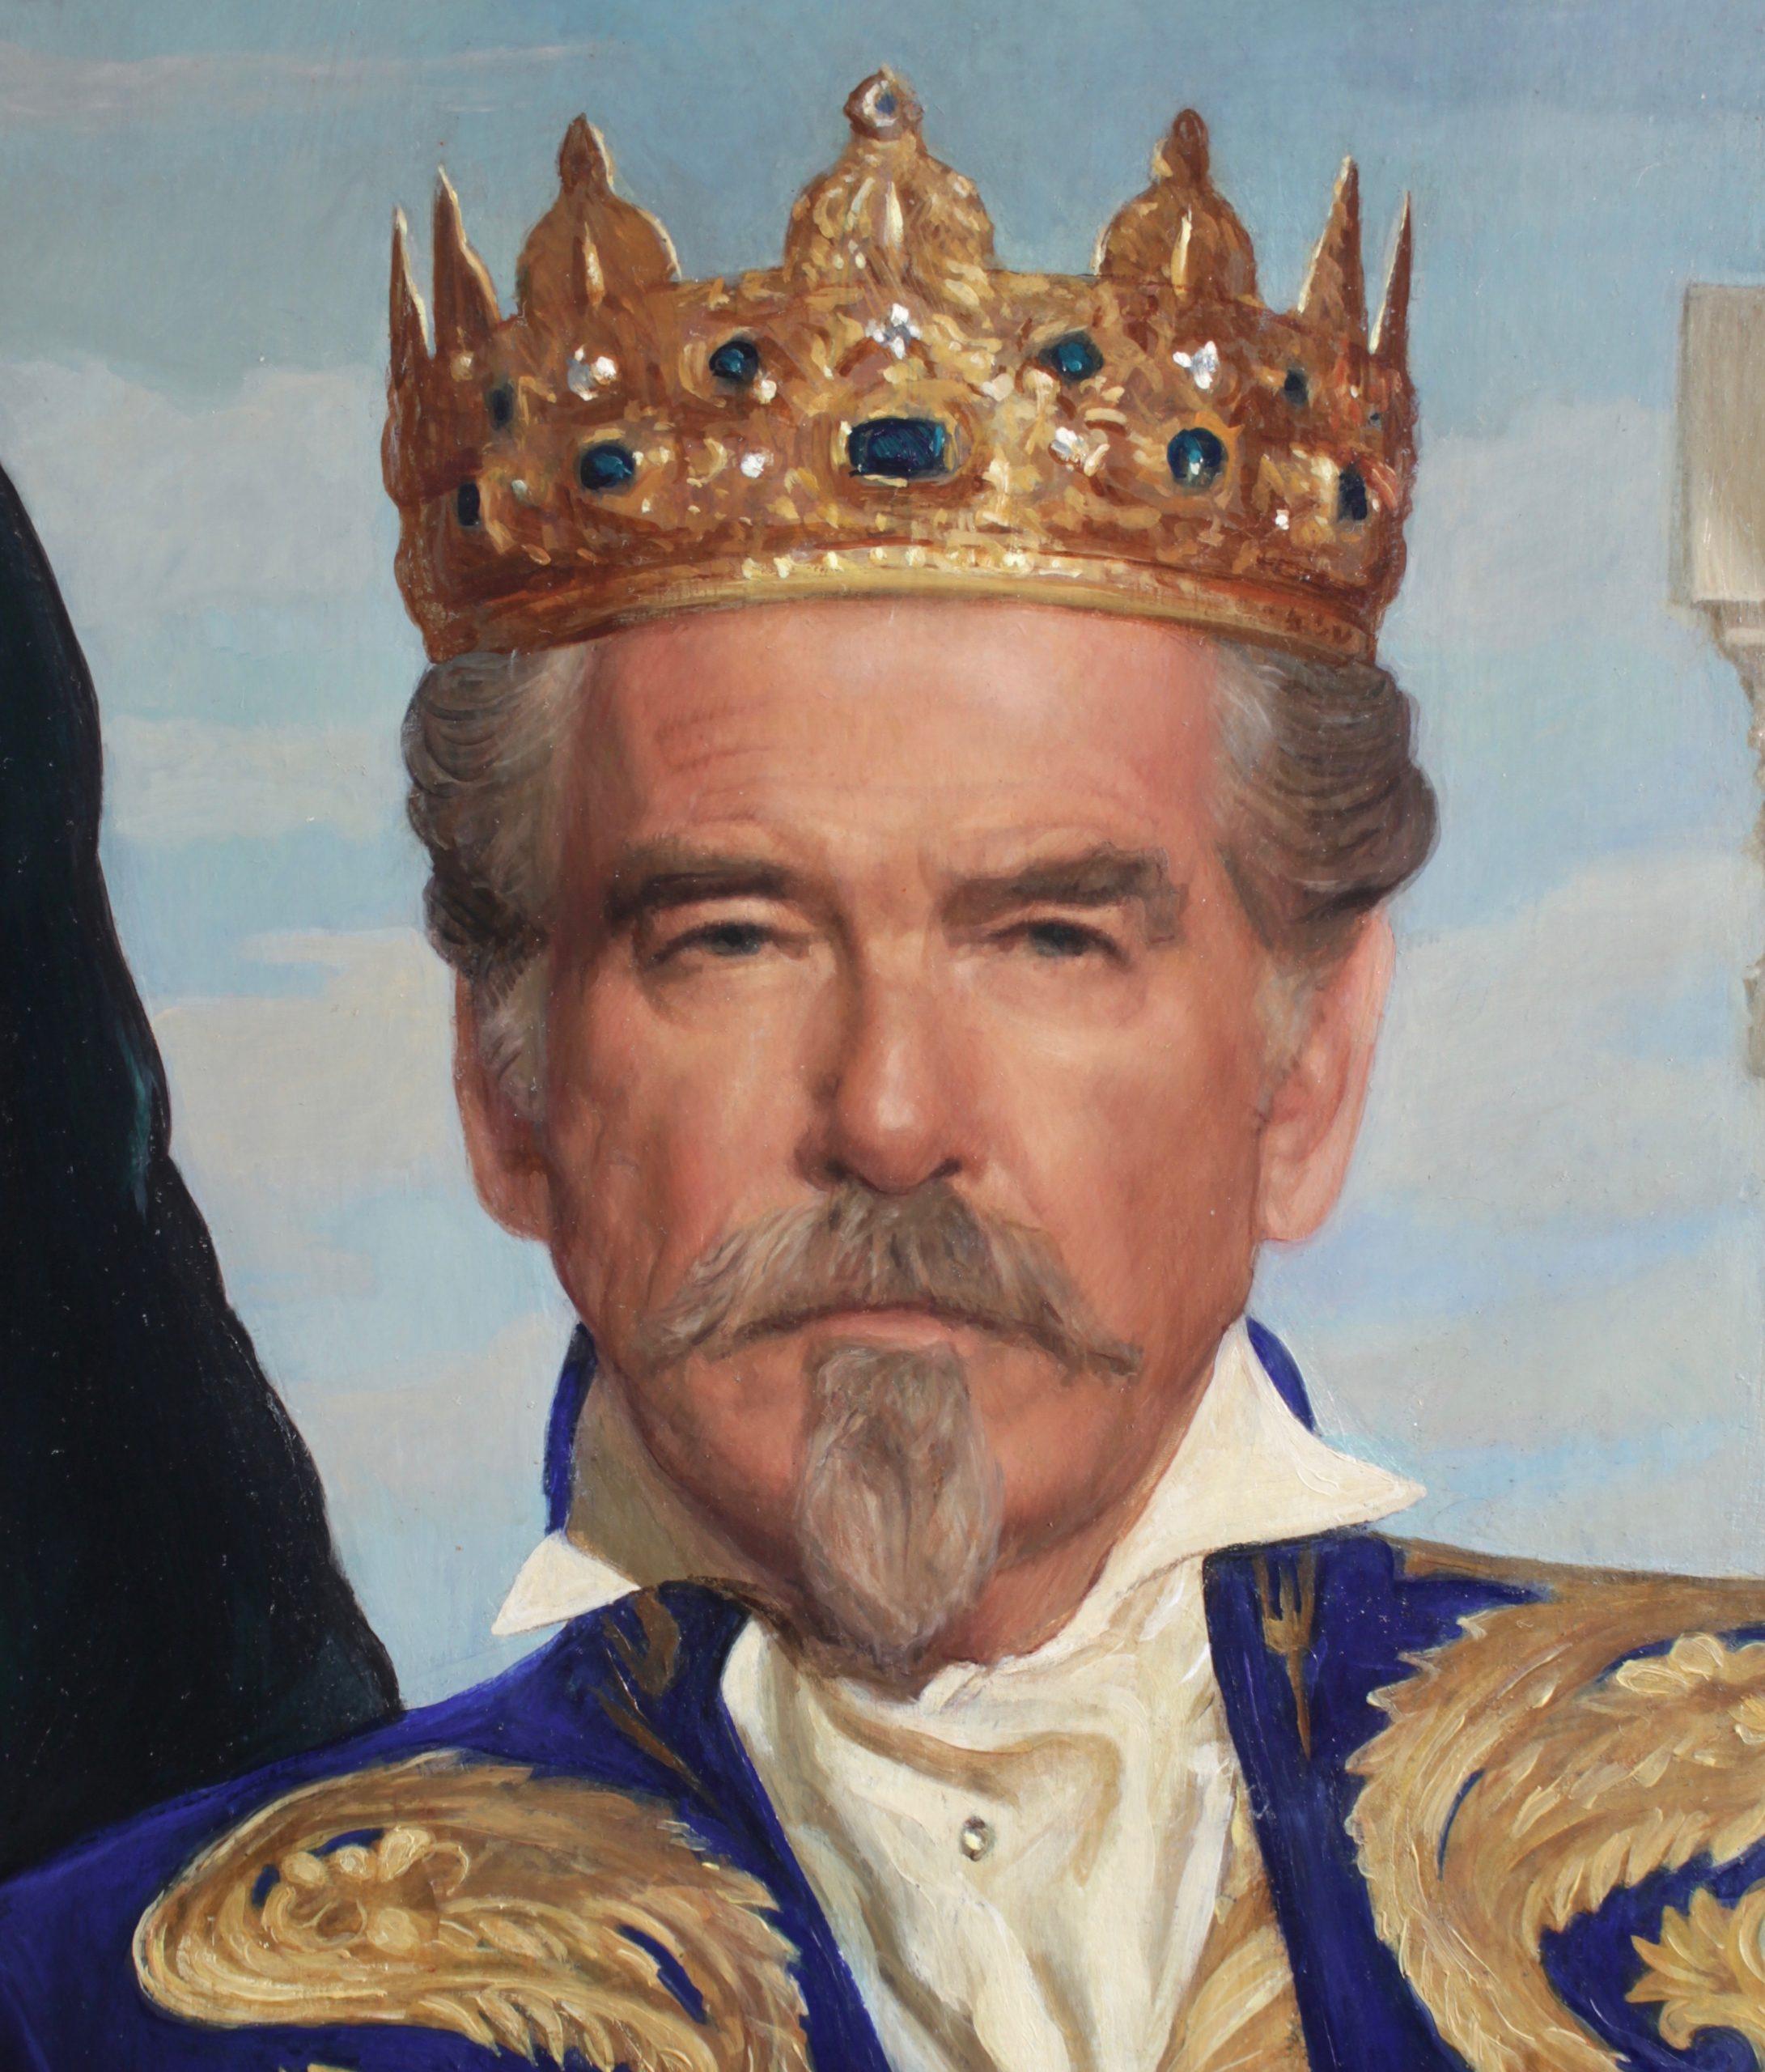 Oil portrait of Pierce Brosnan by Desmond Mac Mahon for the film Cinderella